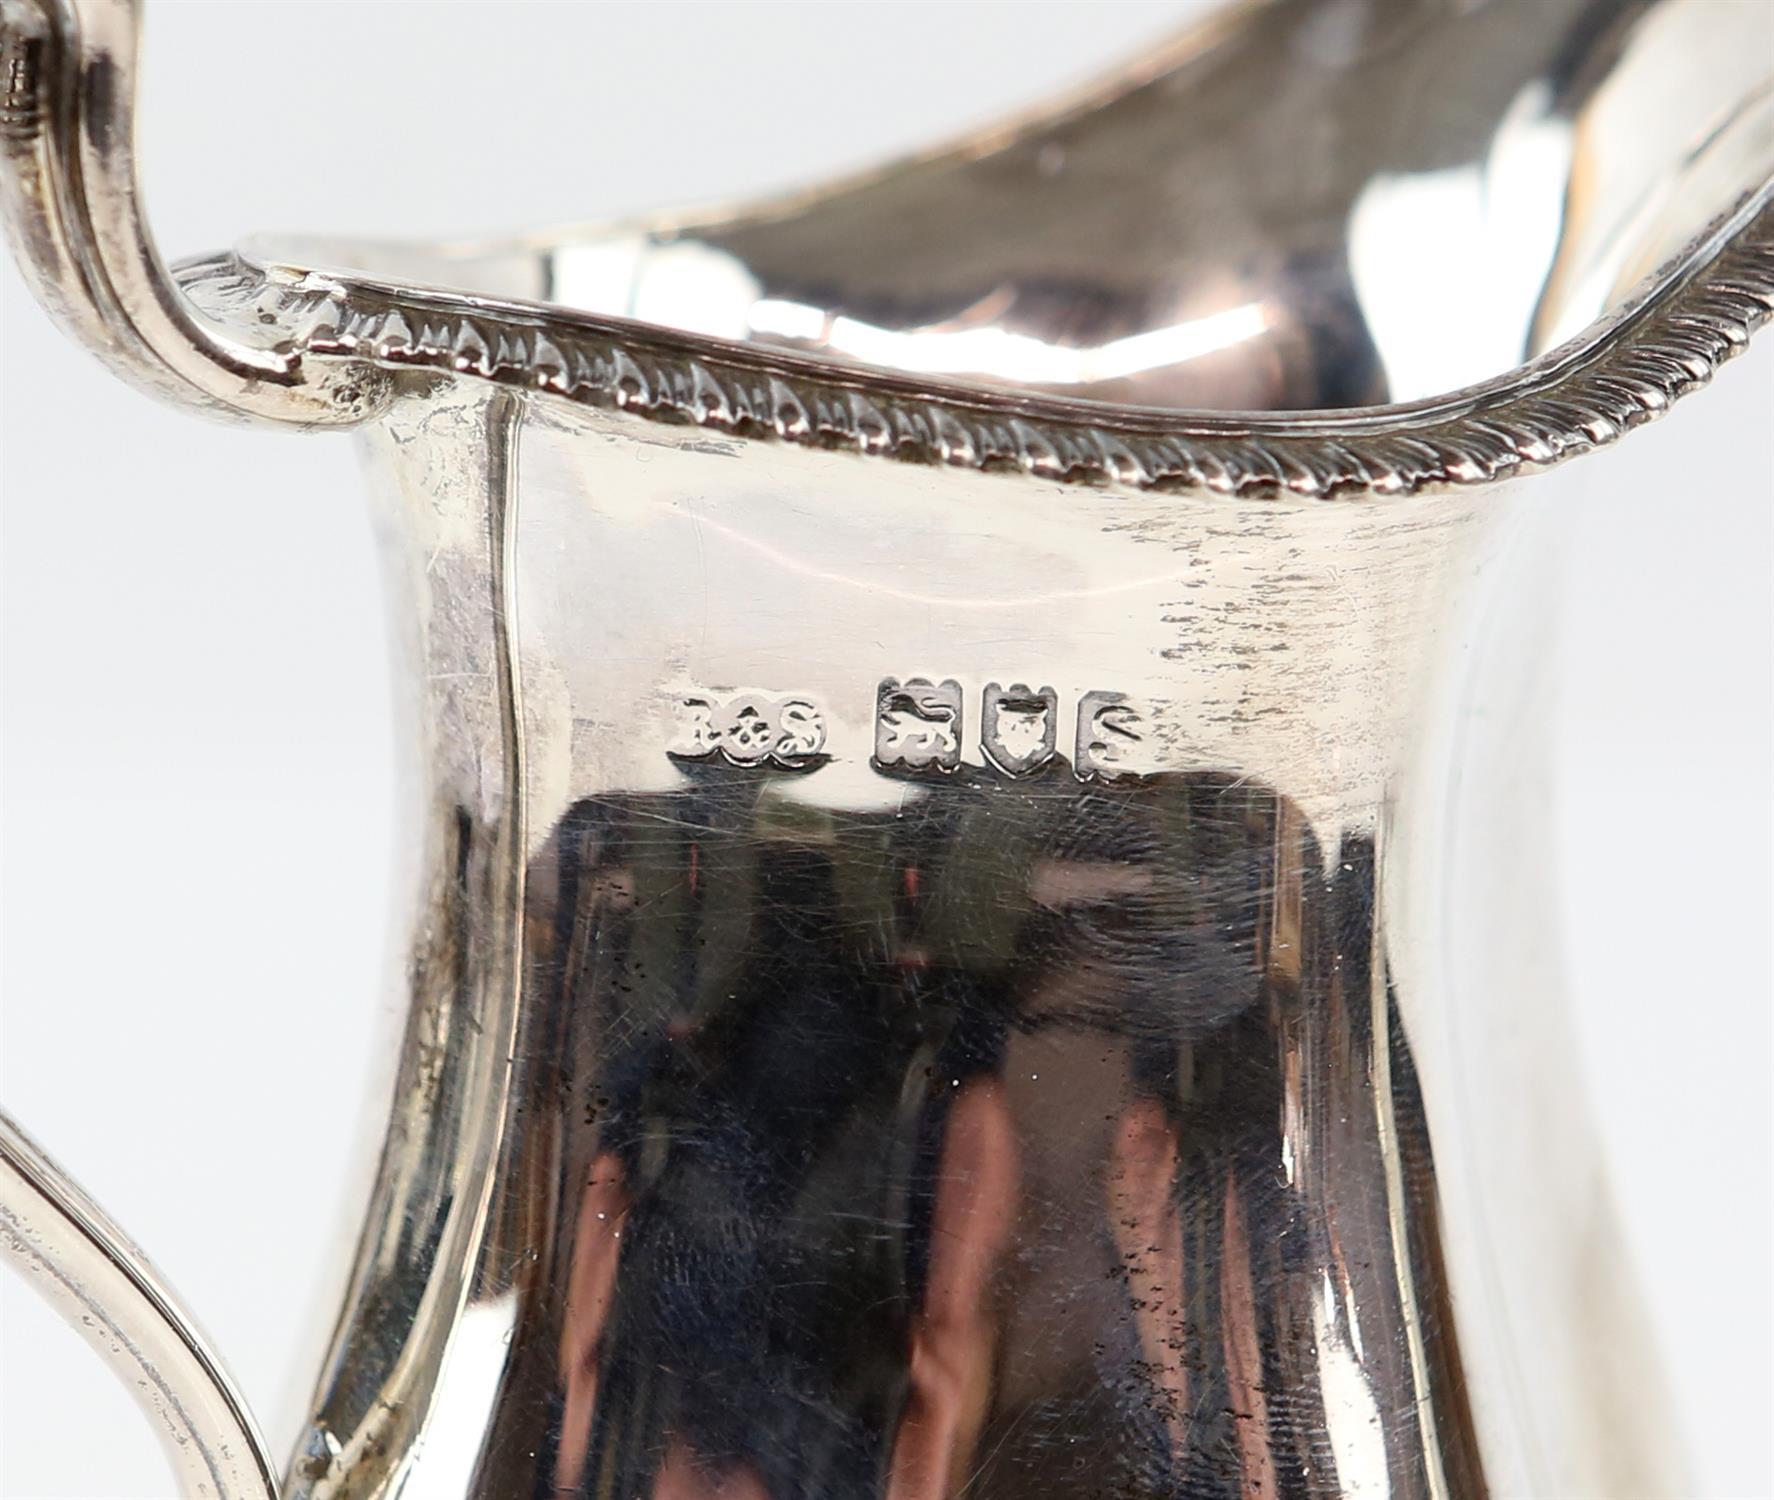 Four piece silver tea and coffee service of fluted diamond shape comprising Coffee Pot, Tea Pot, - Image 9 of 10